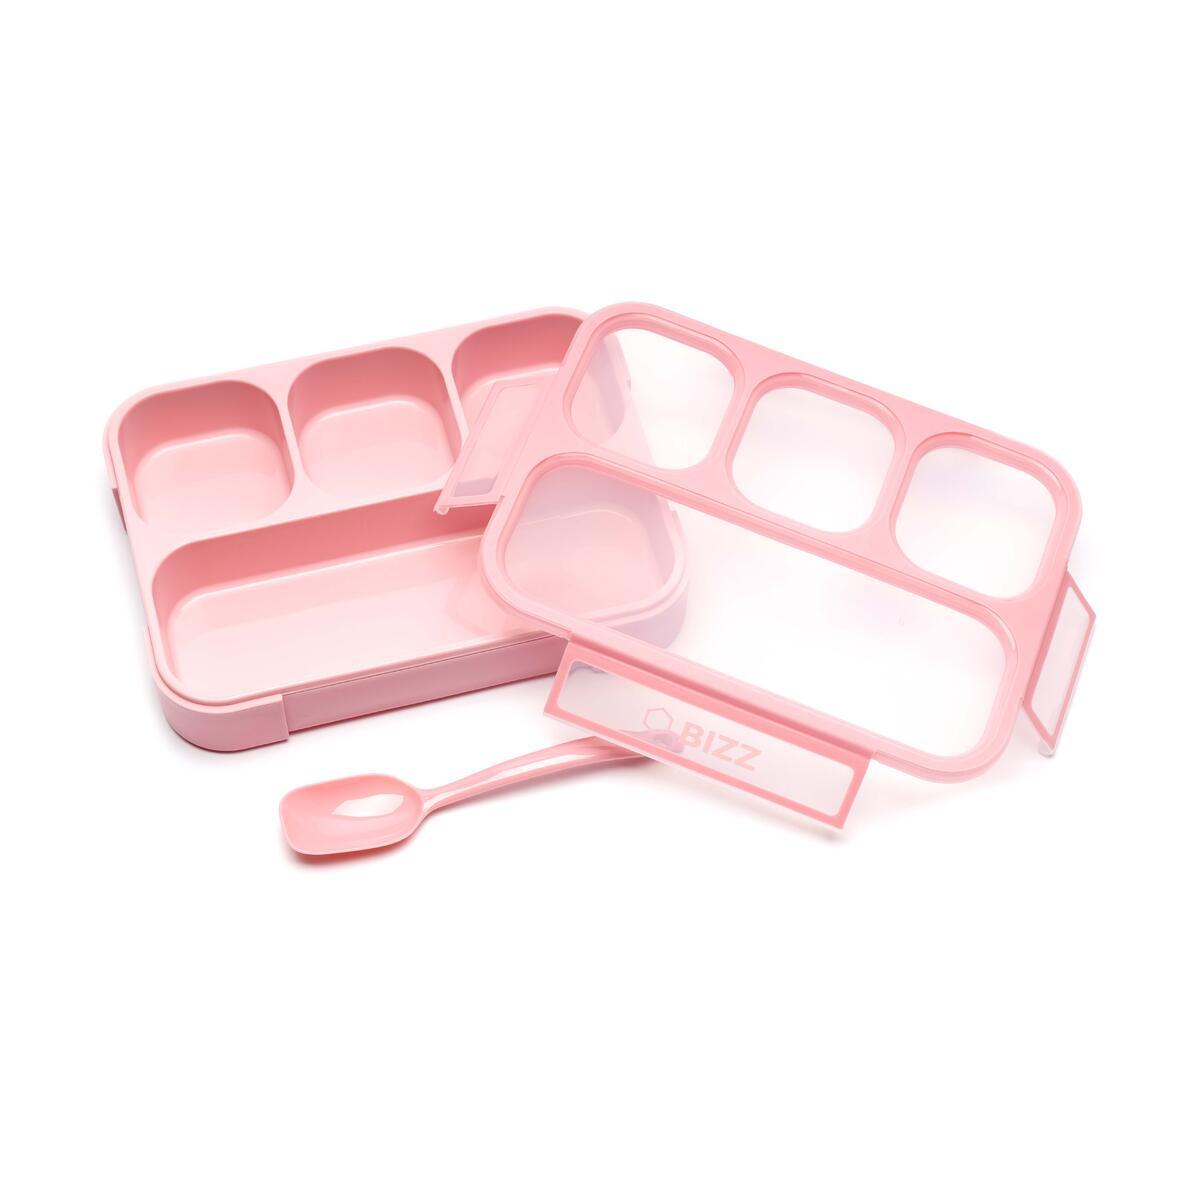 Bento Box & Bag - Spoon Included